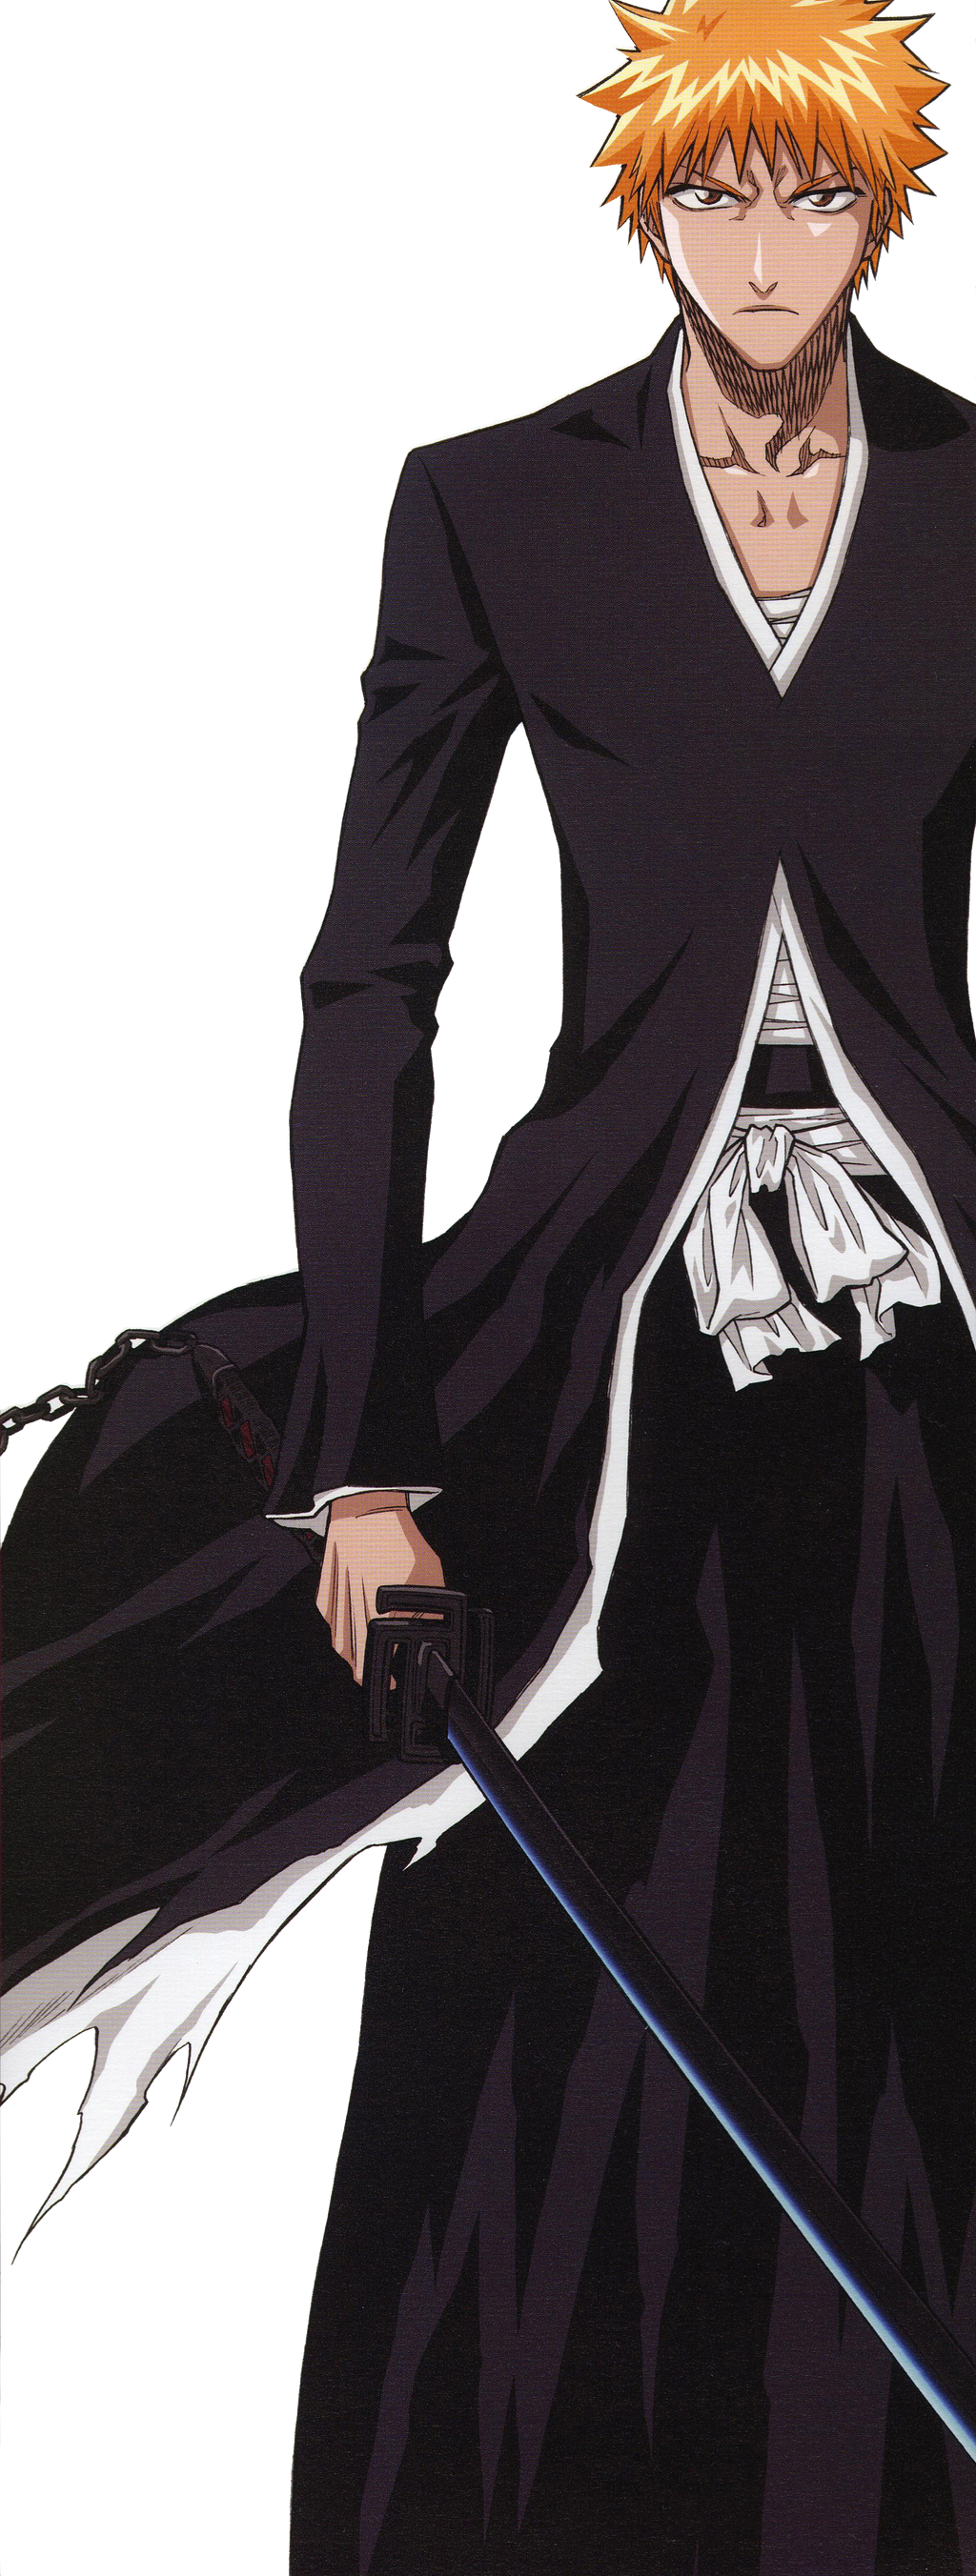 Bleach Ichigo Bankai Render